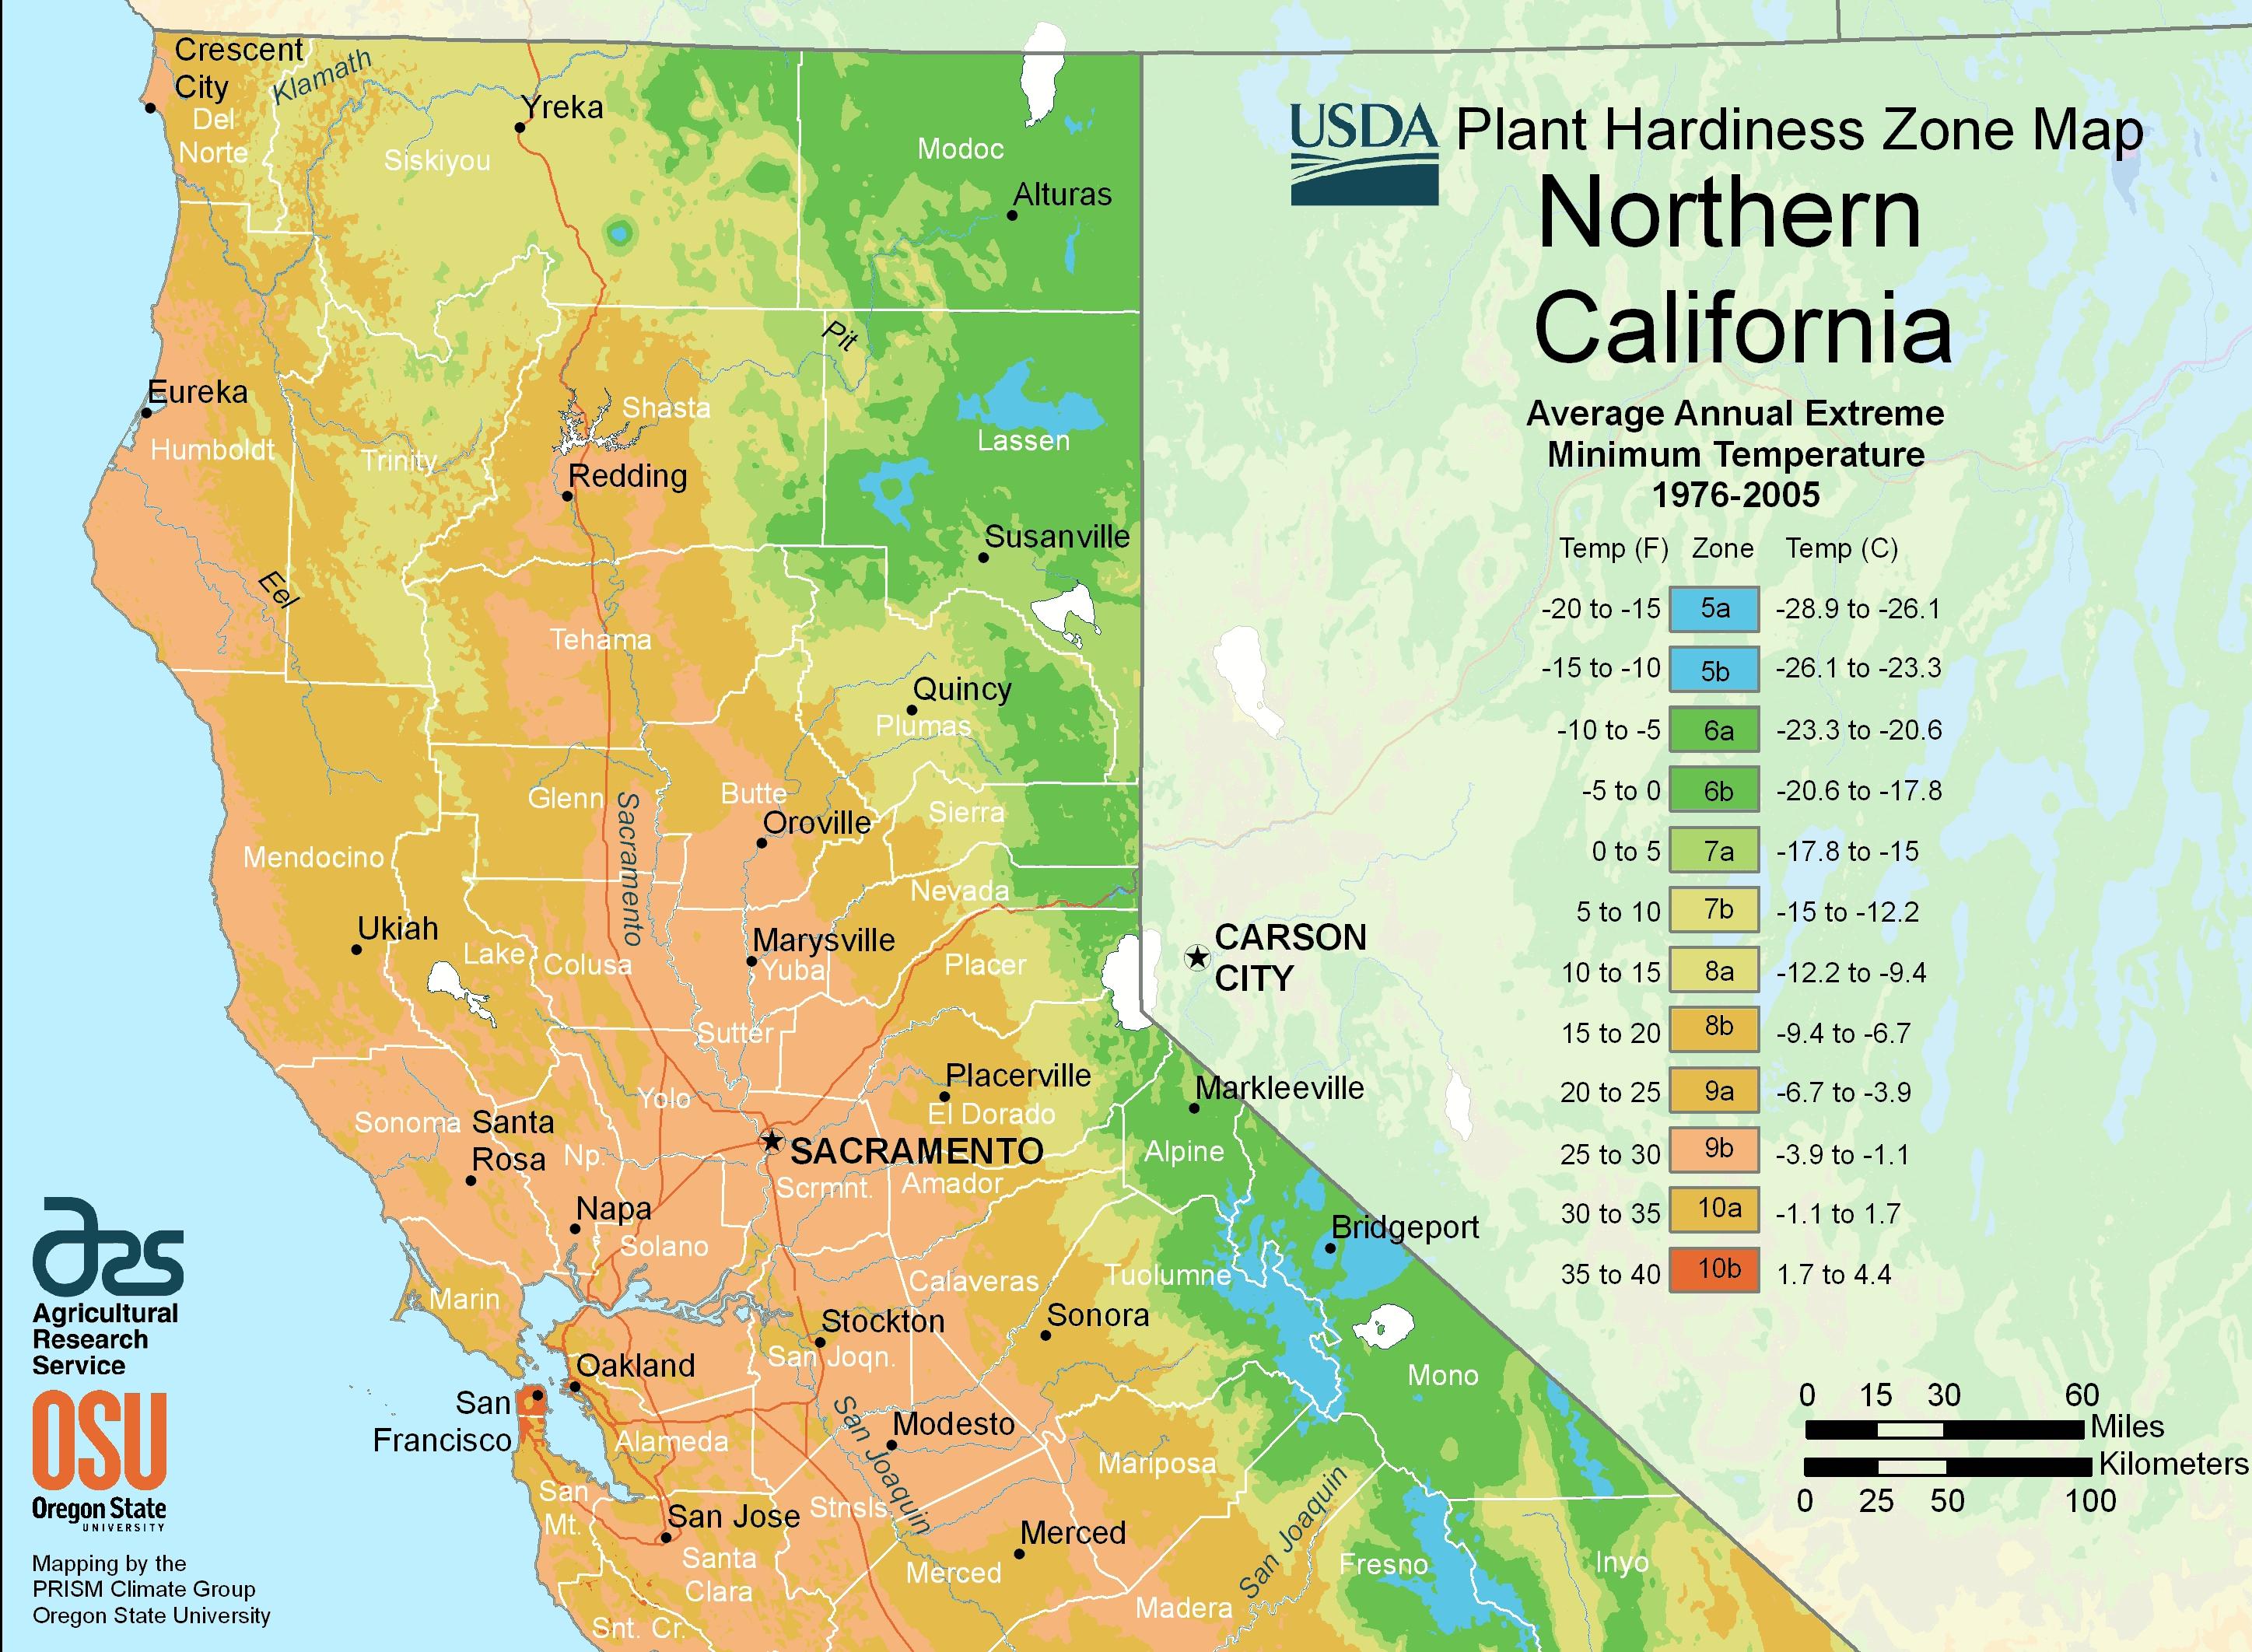 North California Plant Hardiness Zone Map • Mapsof for California Zone Map